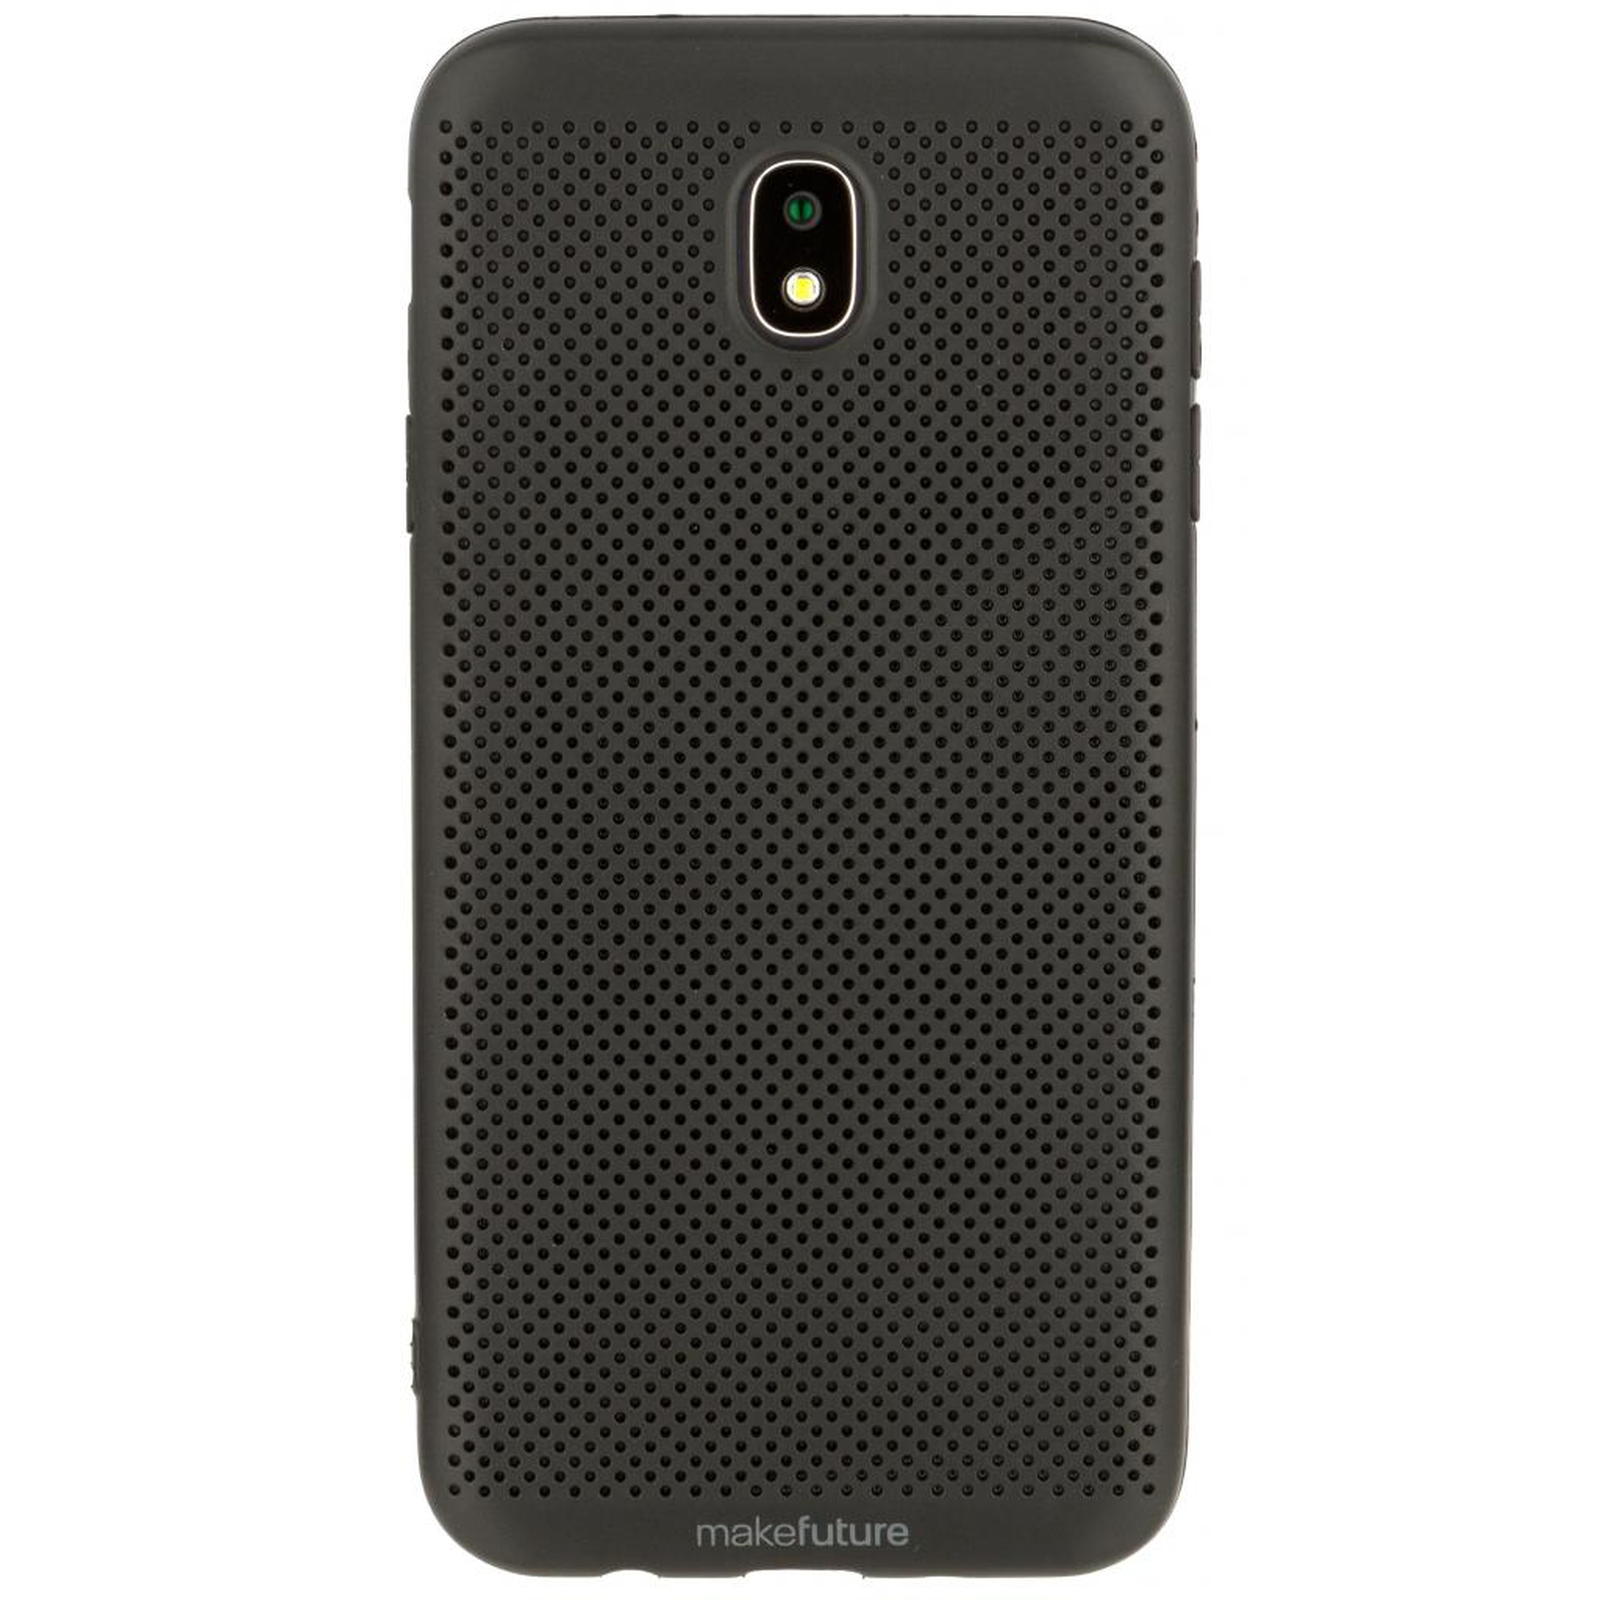 Чехол для моб. телефона MakeFuture Moon Case (TPU) для Samsung J7 2017 (J730) Black (MCM-SJ730BK)